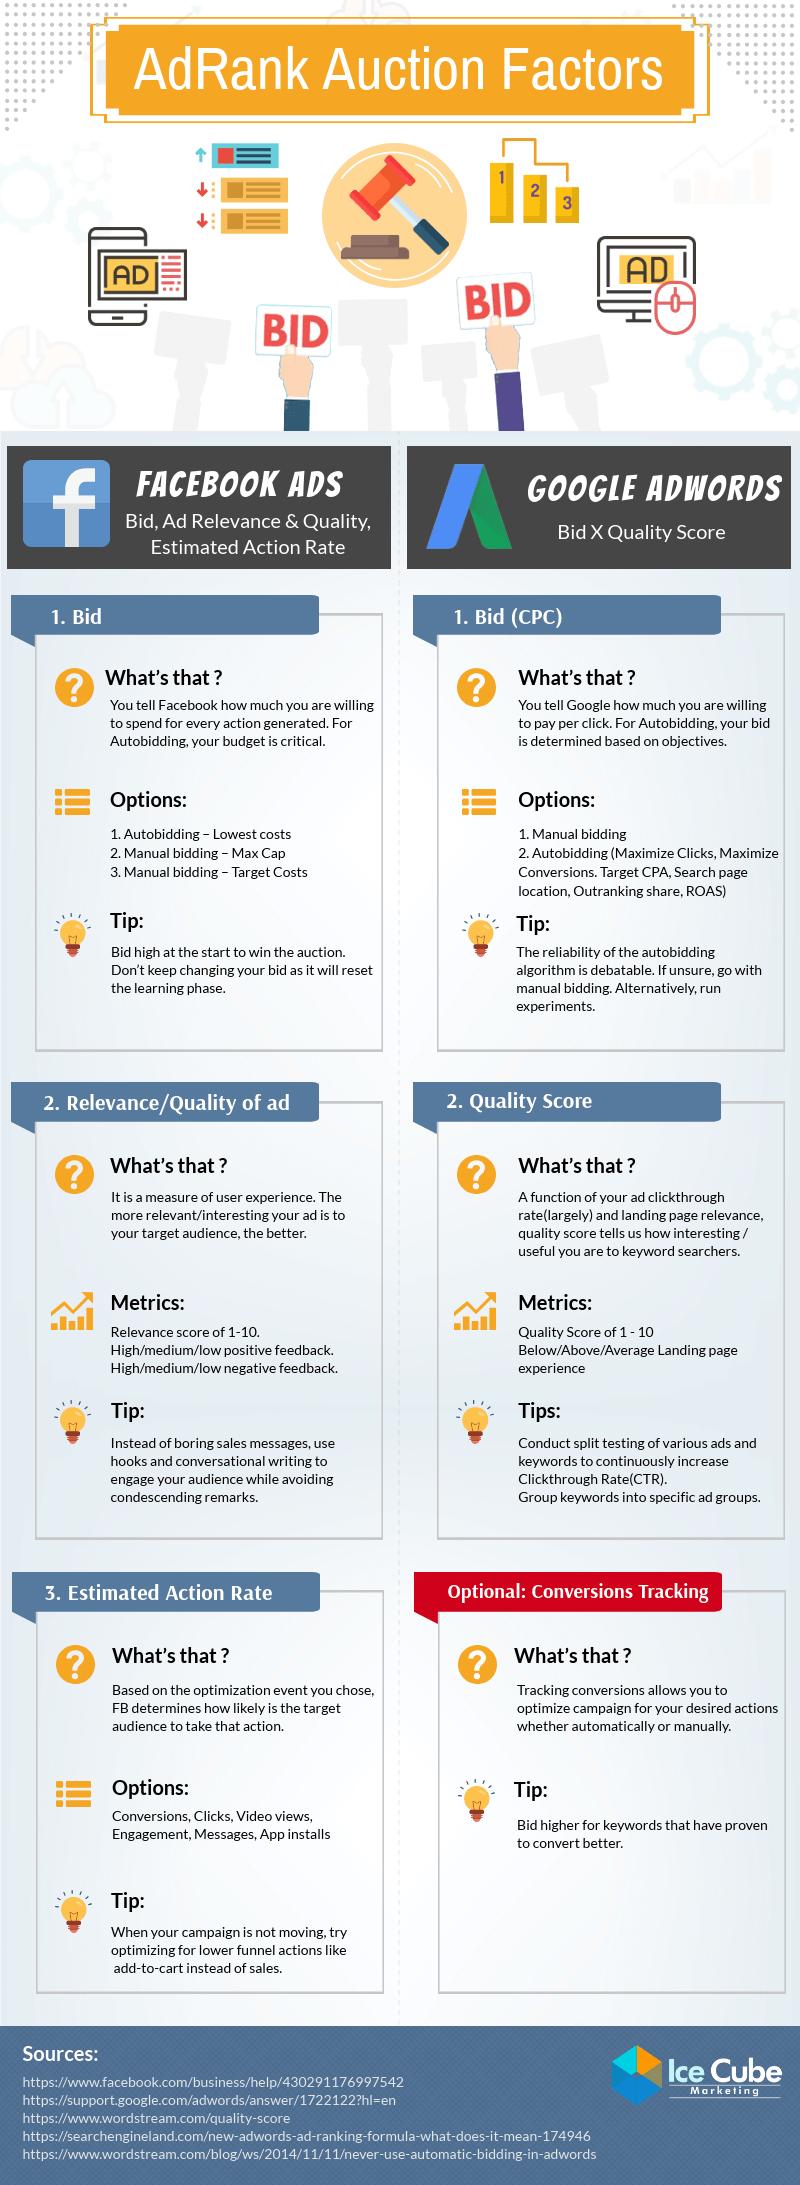 A comparison of Google and Facebook ads auction platform